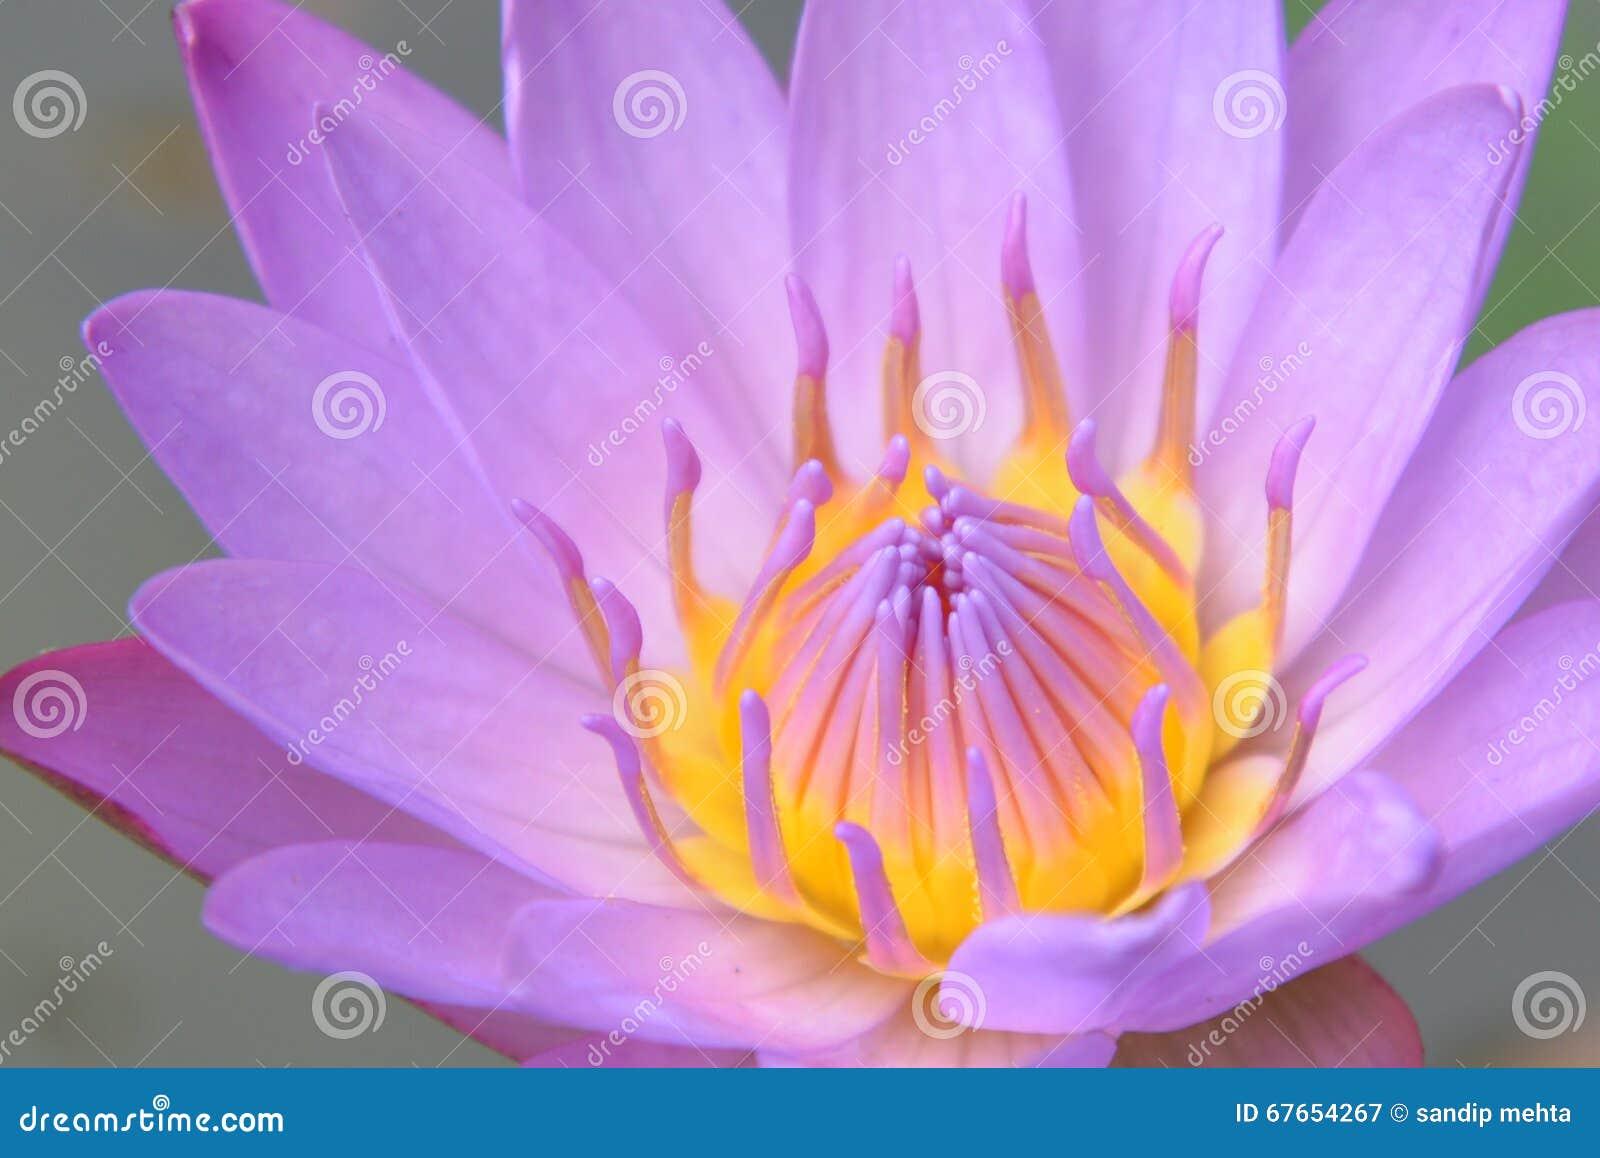 Lotus stock image image of blossom petal flower plant 67654267 download lotus stock image image of blossom petal flower plant 67654267 mightylinksfo